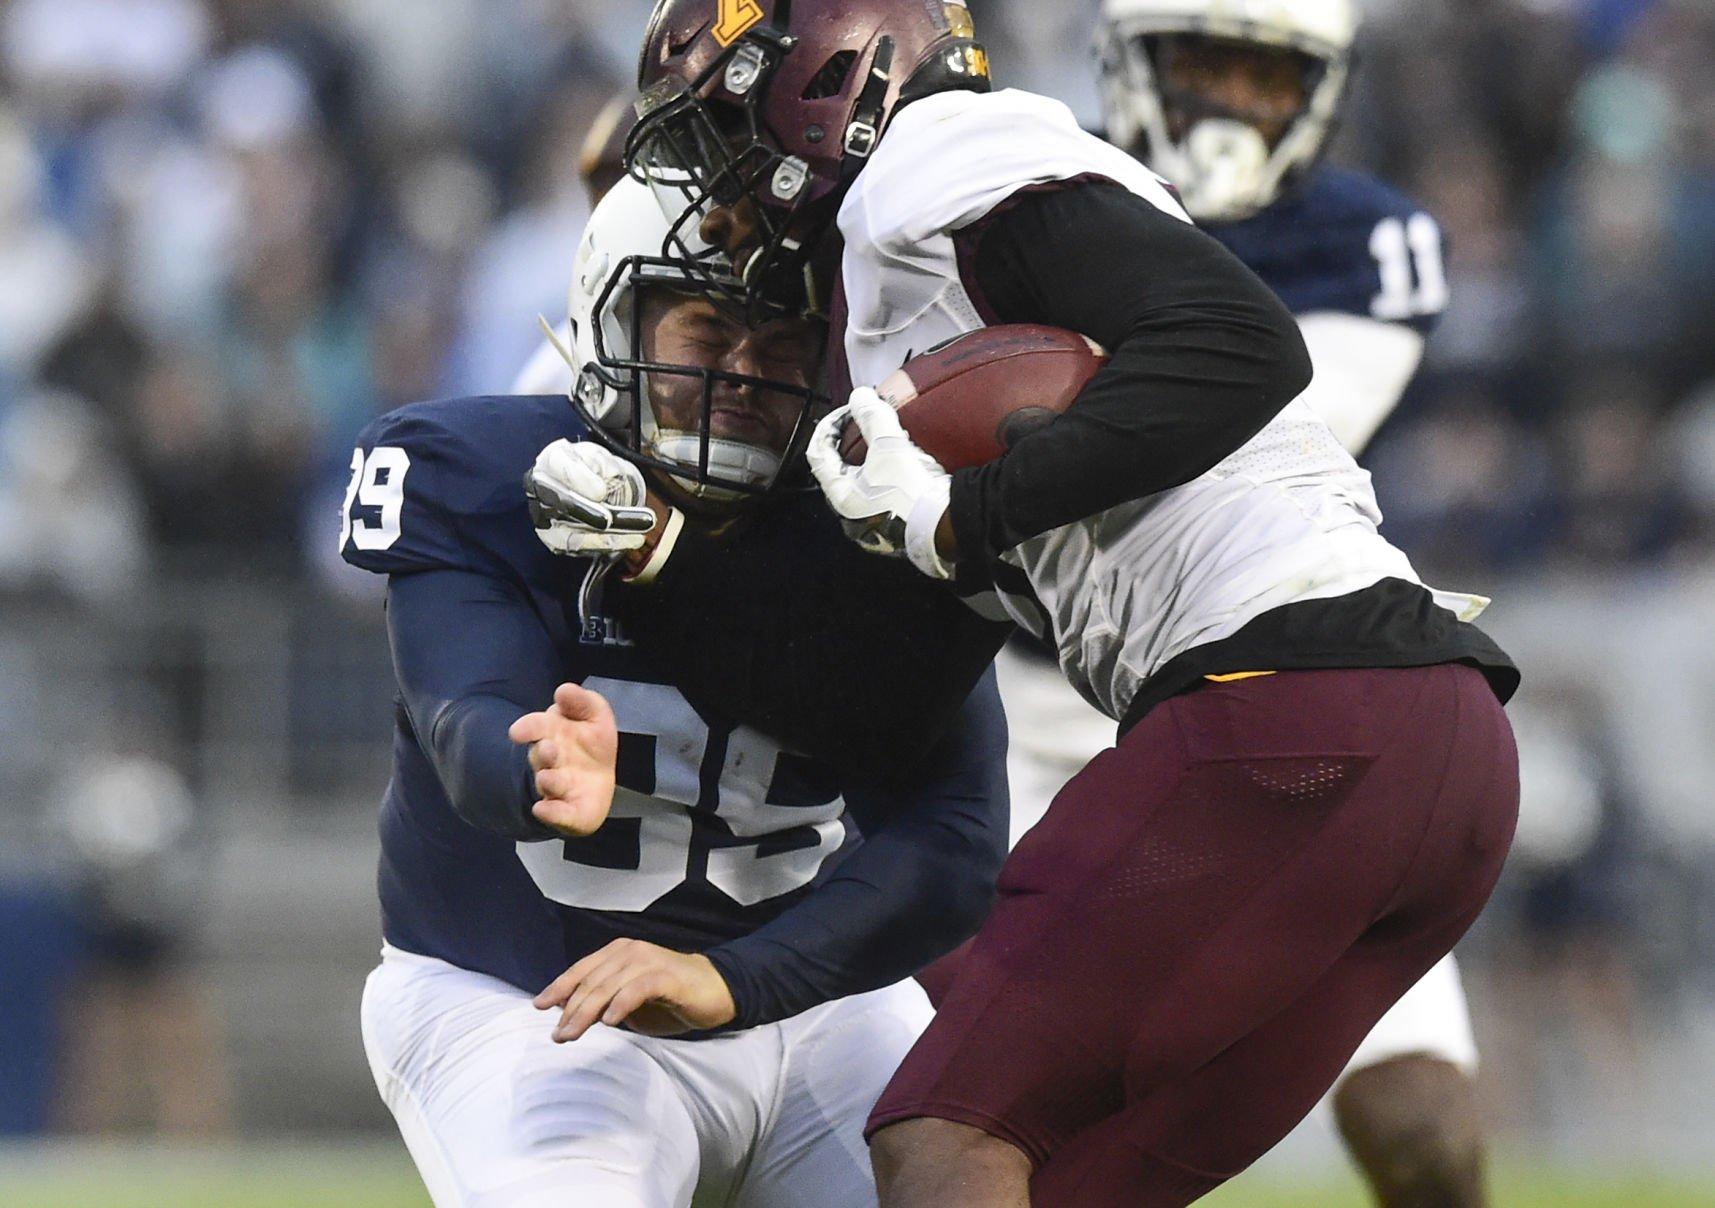 Penn State kicker Joey Julius no longer with team